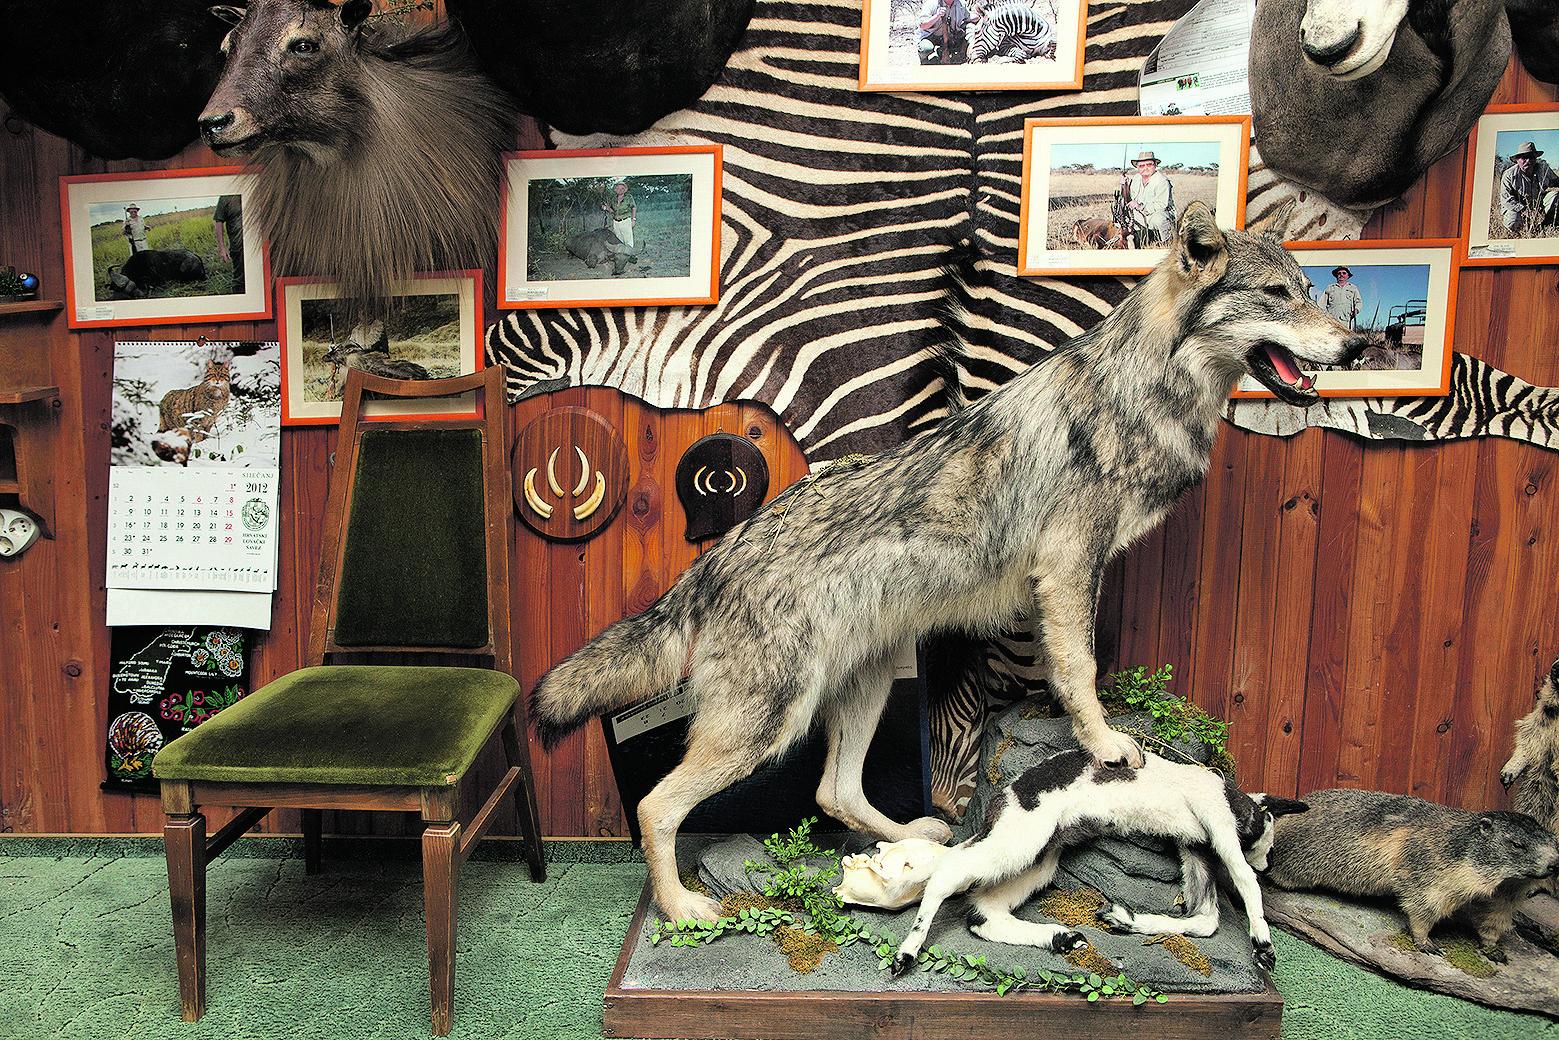 trofejna soba pag 2012 fotografija ivan posavec